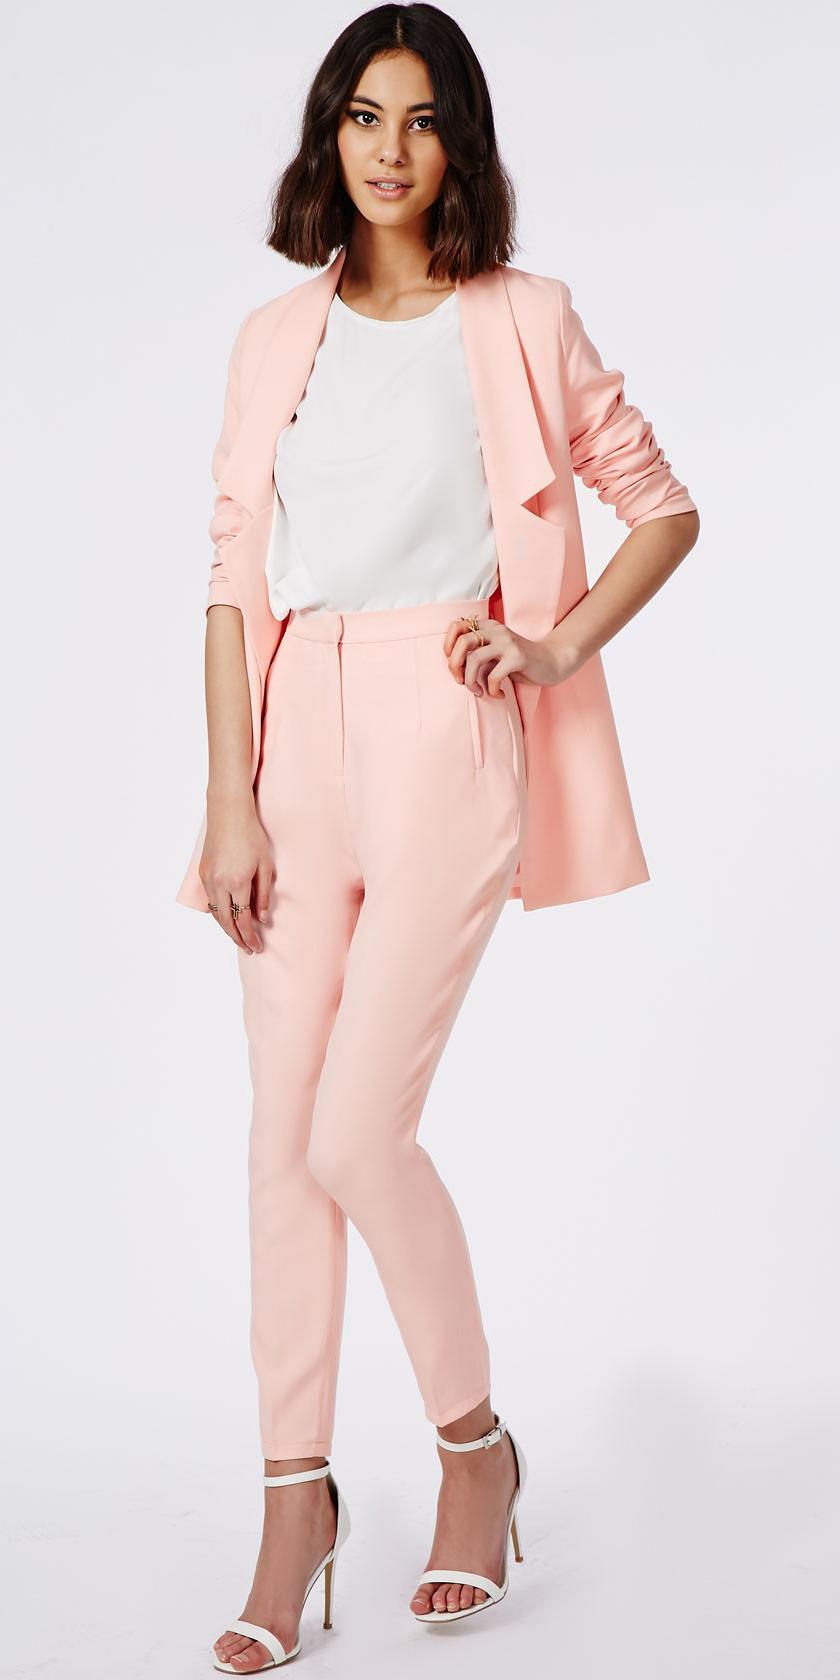 r-pink-light-slim-pants-white-top-pink-light-jacket-blazer-suit-white-shoe-sandalh-howtowear-fashion-style-outfit-spring-summer-brun-dinner.jpg